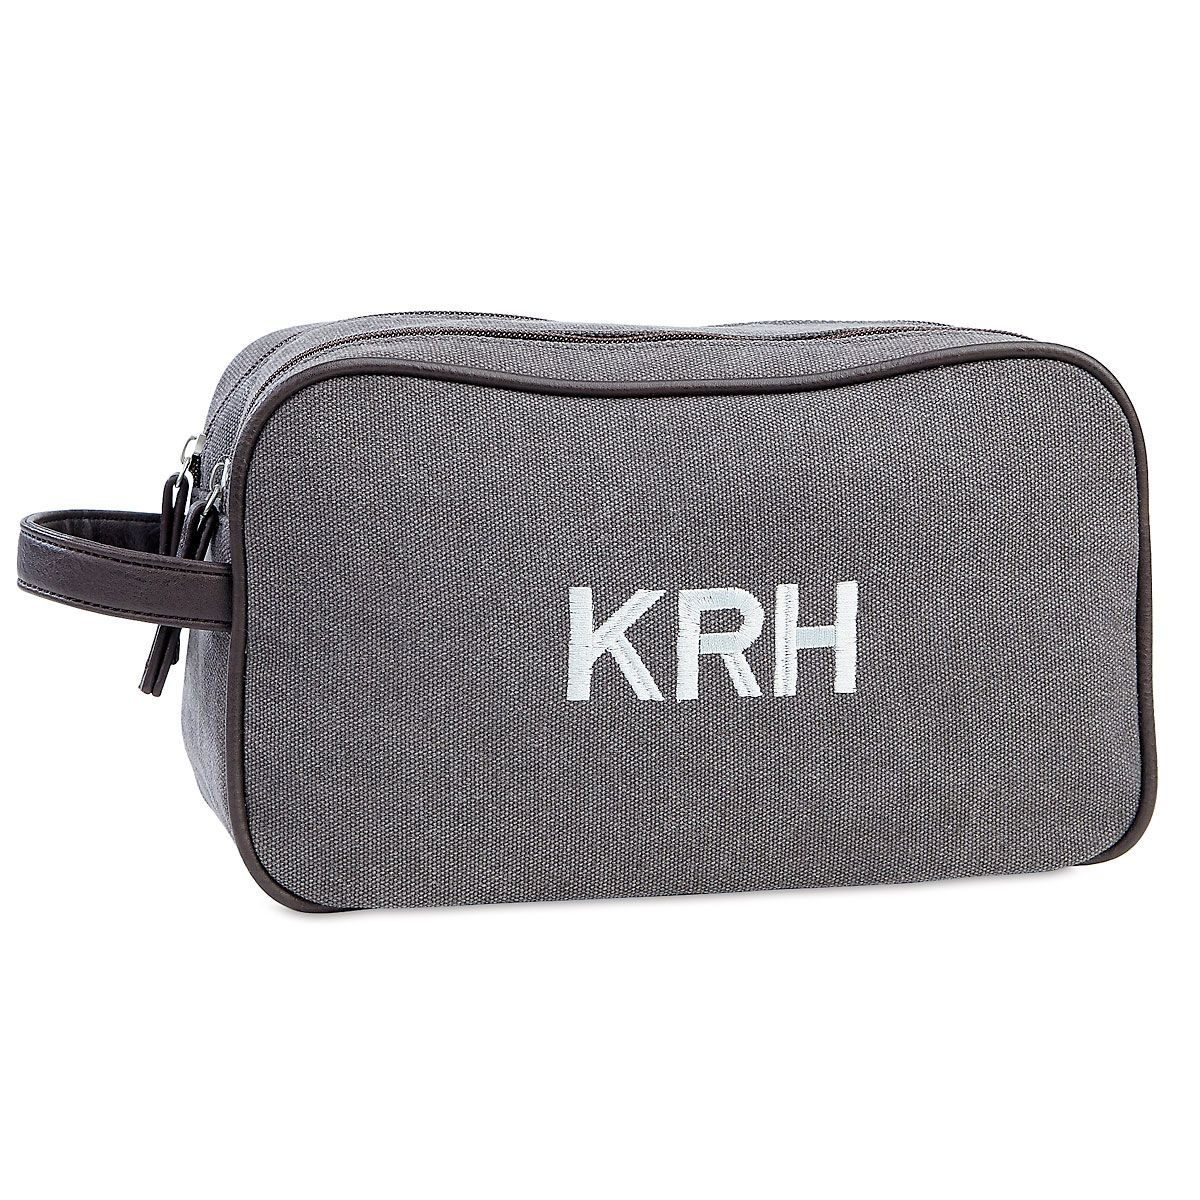 Customized Man-Style Toiletry Bag - Dark Grey